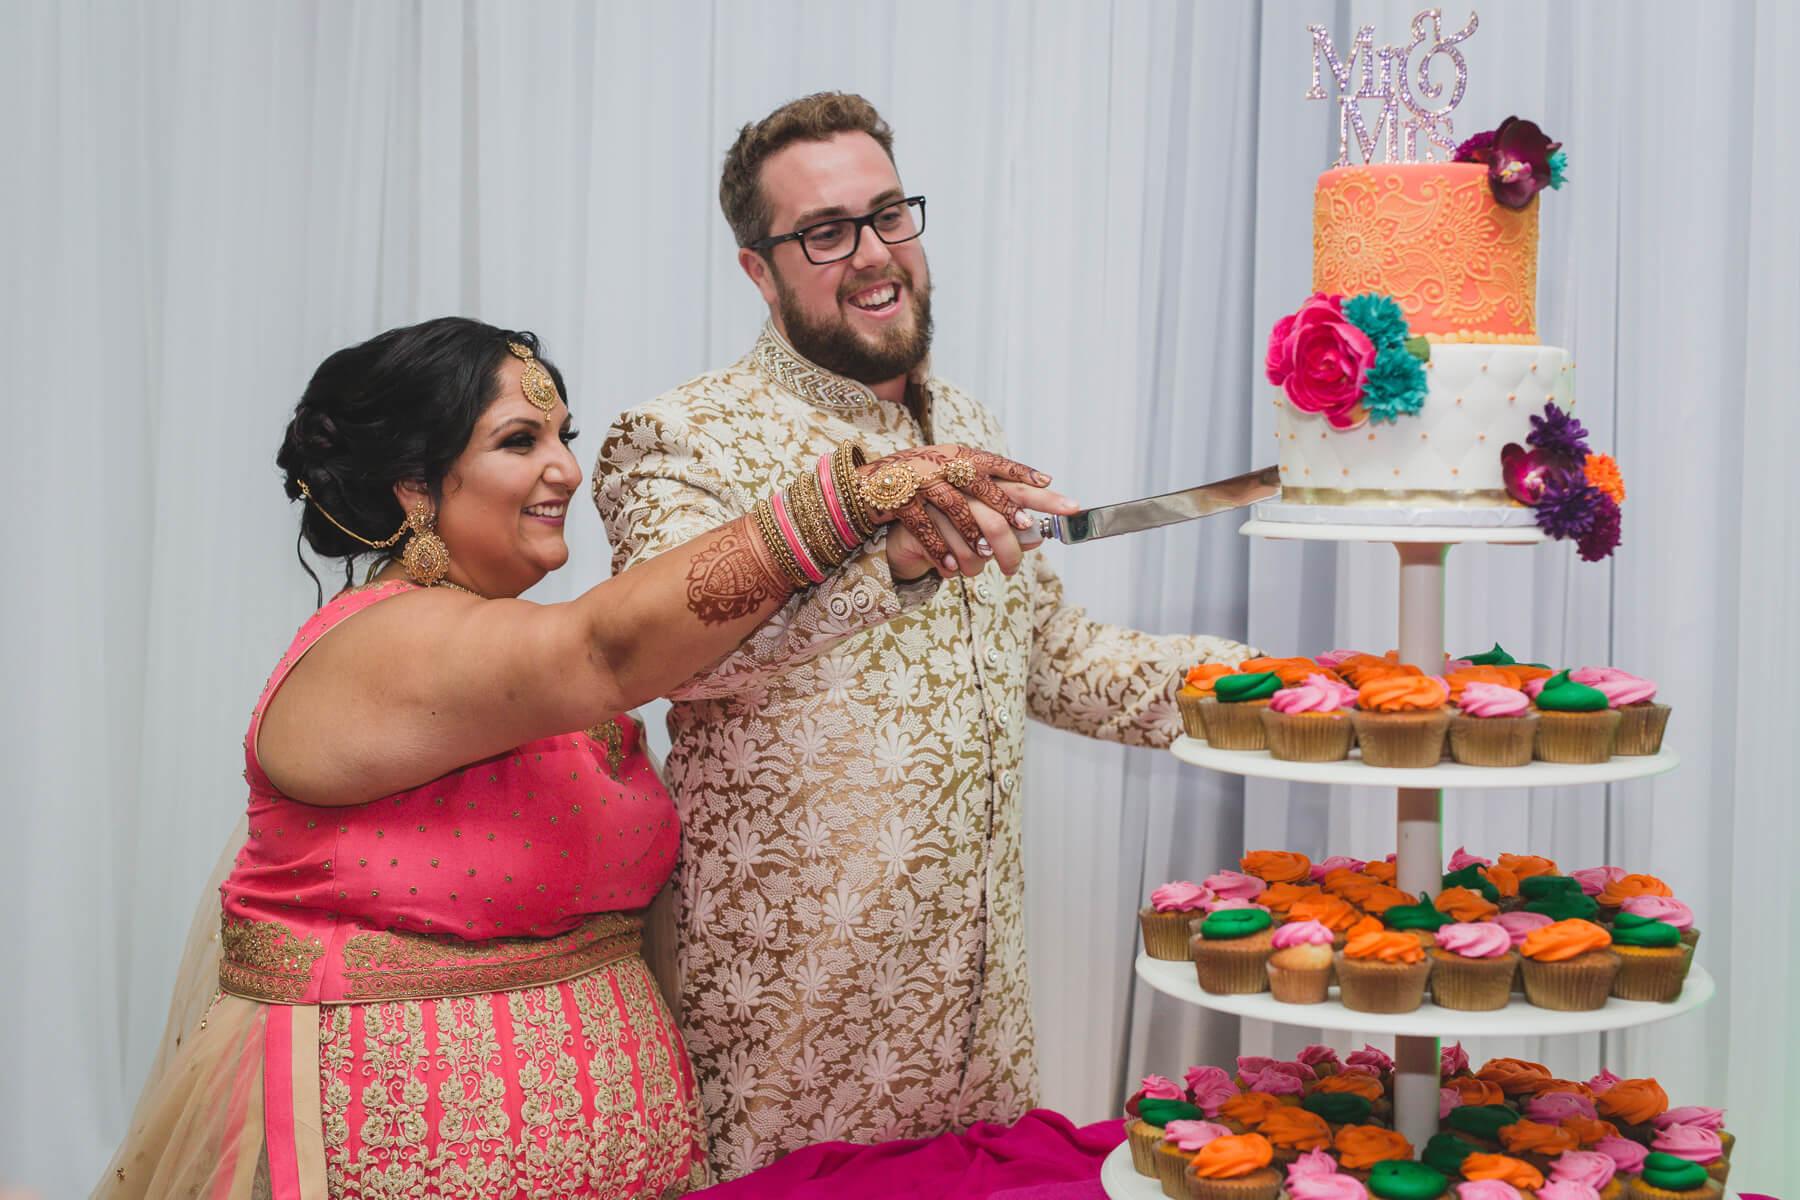 wedding cake cutting neet's treats